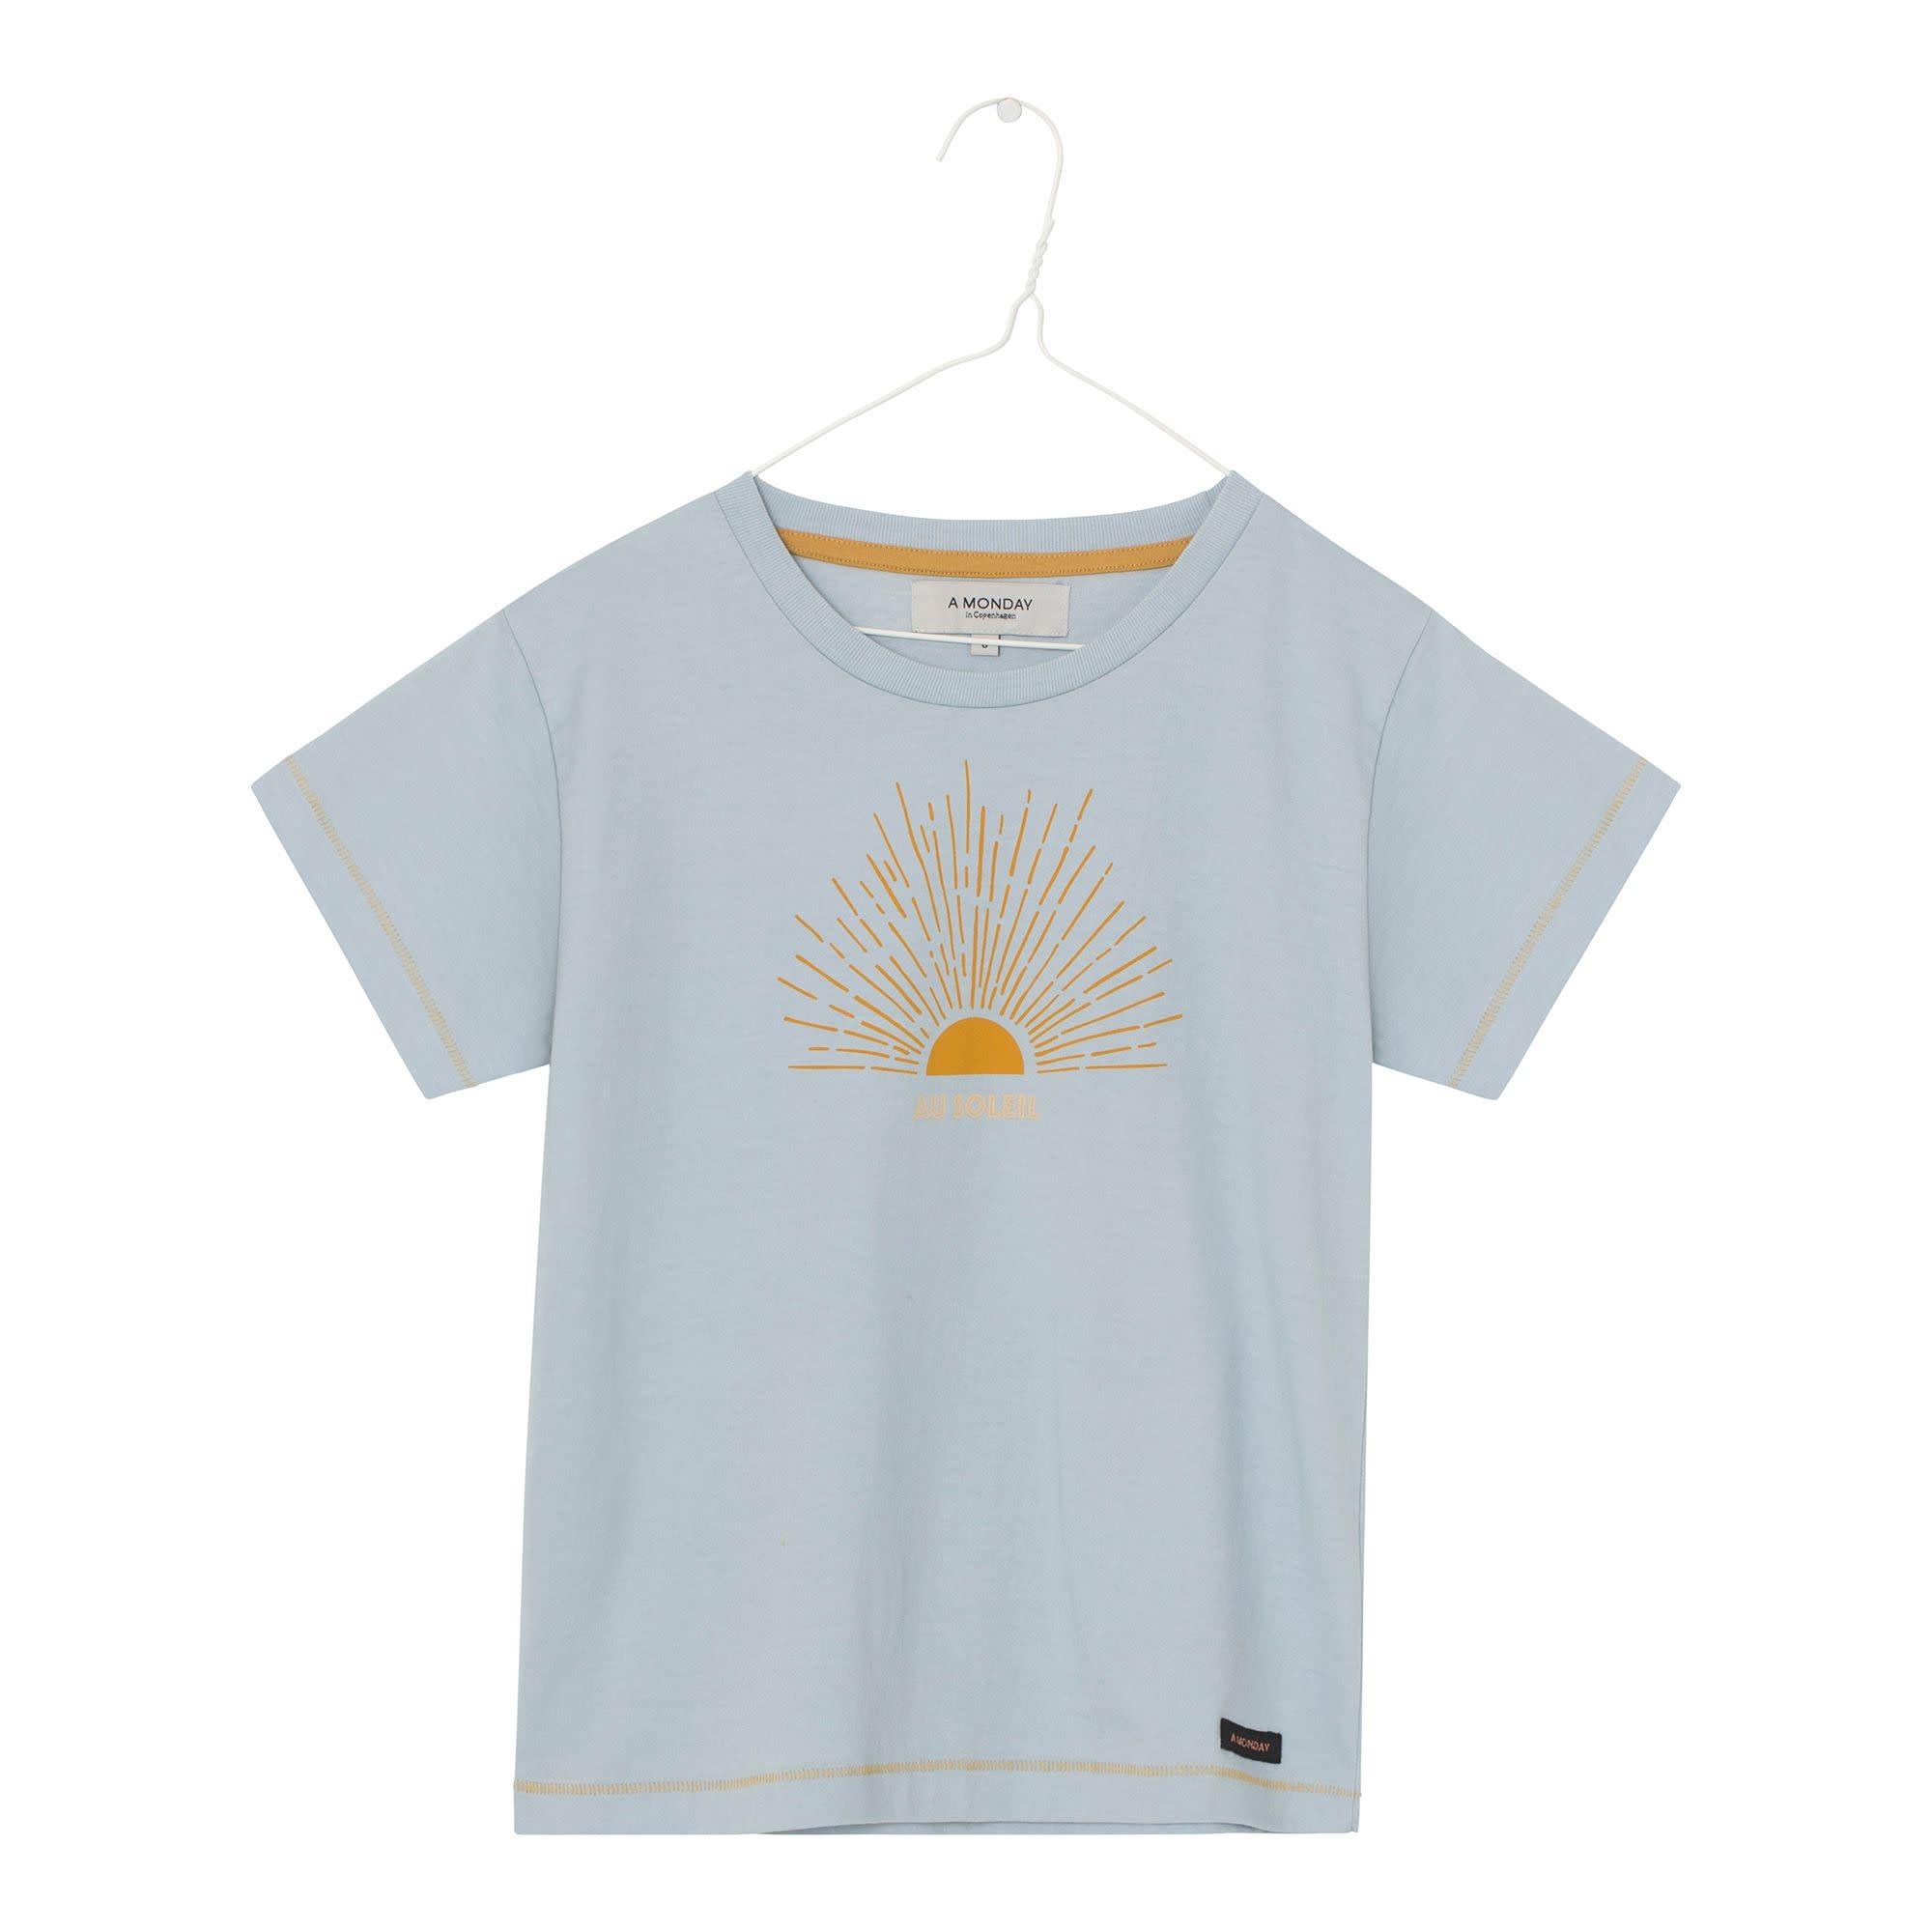 A Monday A monday - Sun t-shirt pearl blue